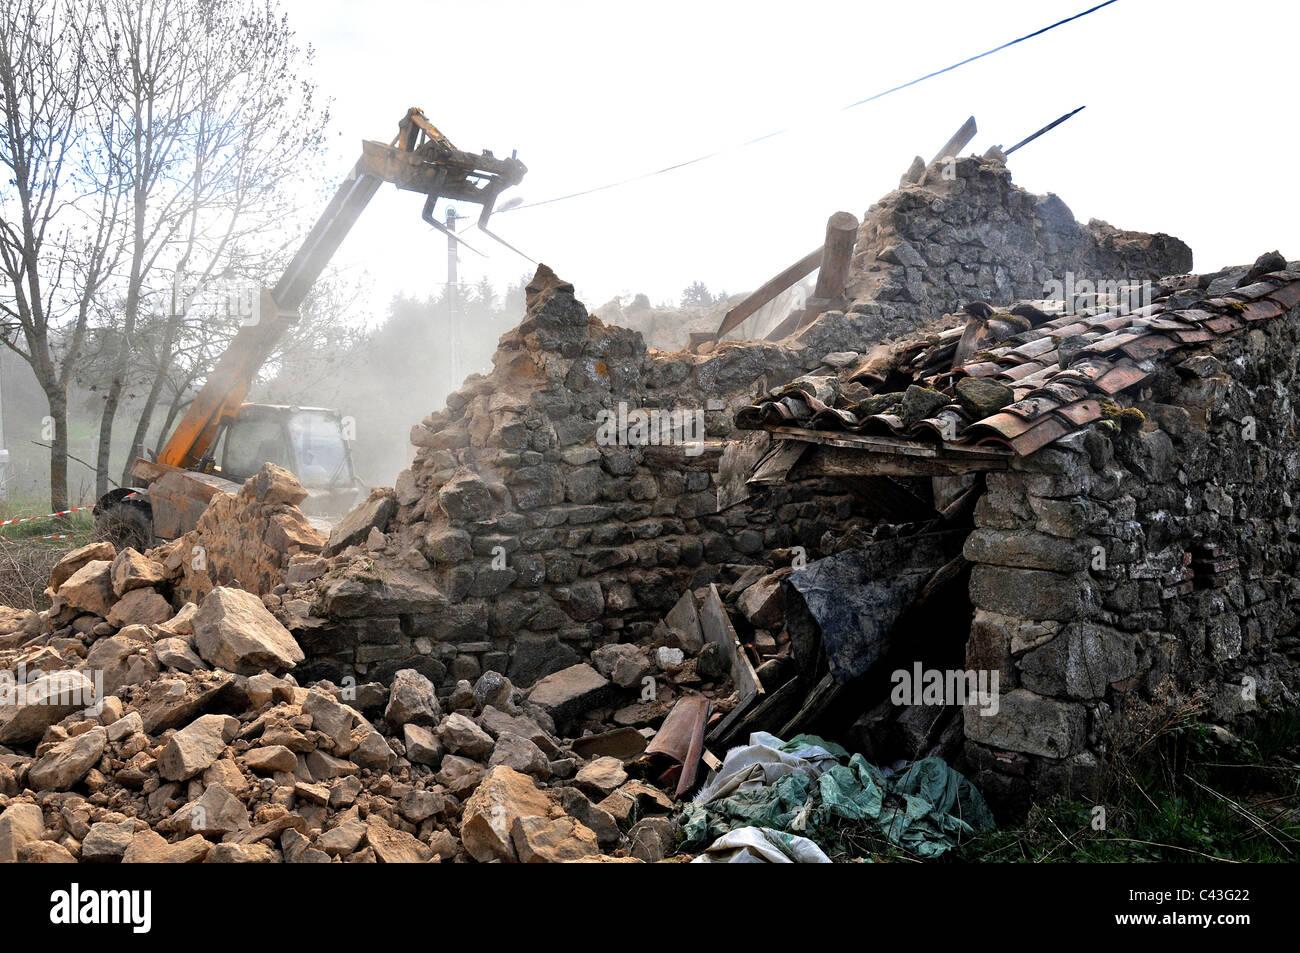 house demolition Chaméane Auvergne France - Stock Image